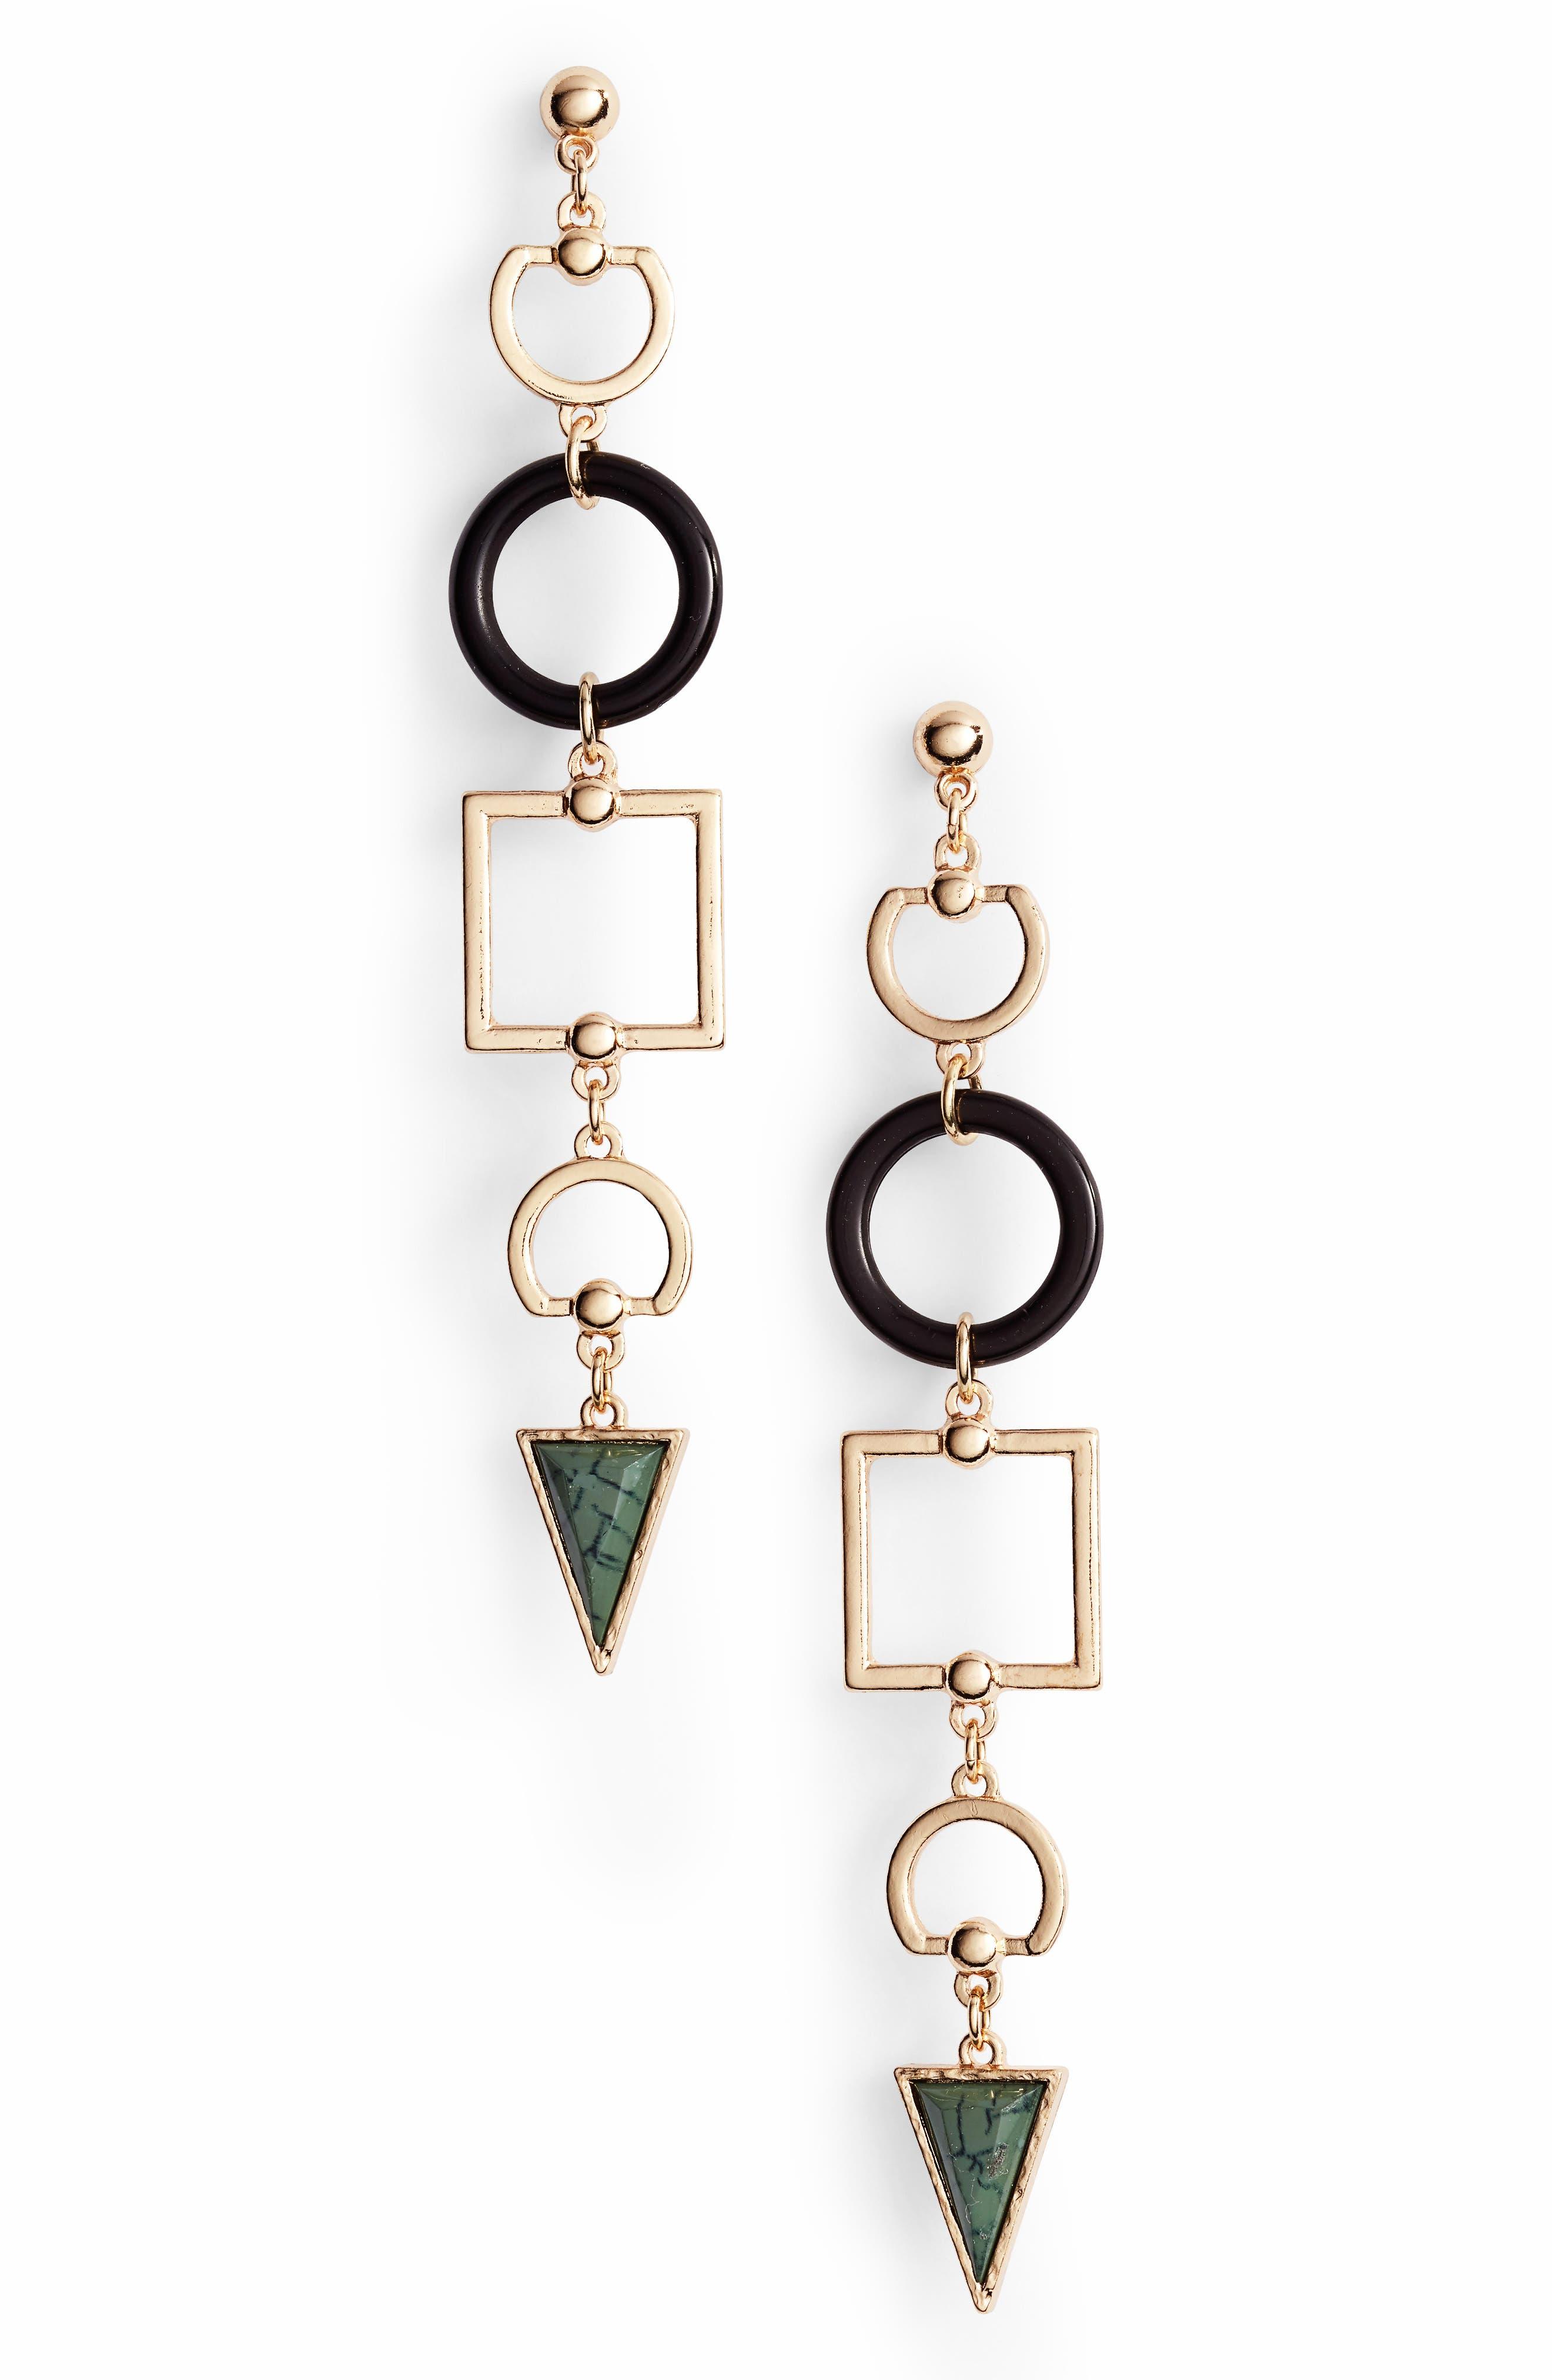 Geometric Stone Drop Earrings,                             Main thumbnail 1, color,                             Gold/ Black/ Green